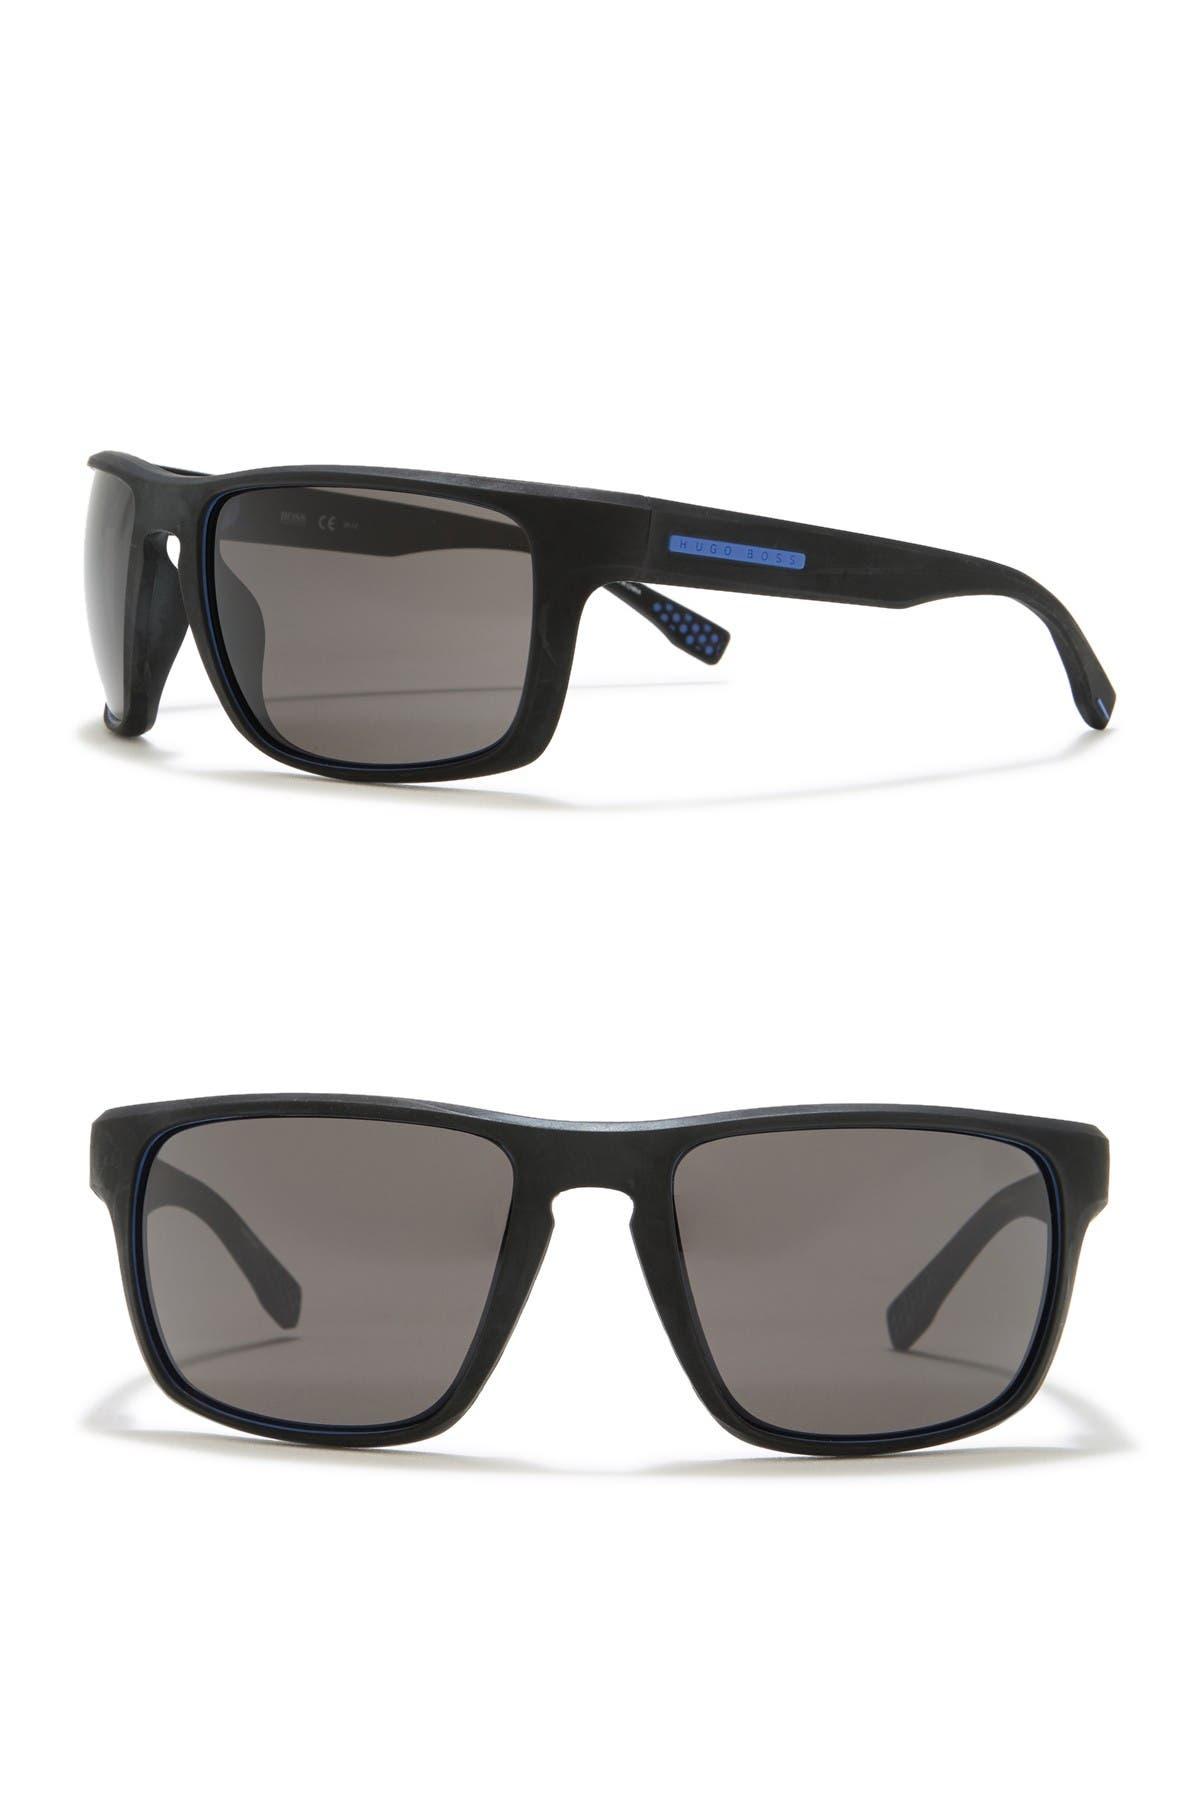 Image of BOSS Polarized 58mm Wrap Sunglasses